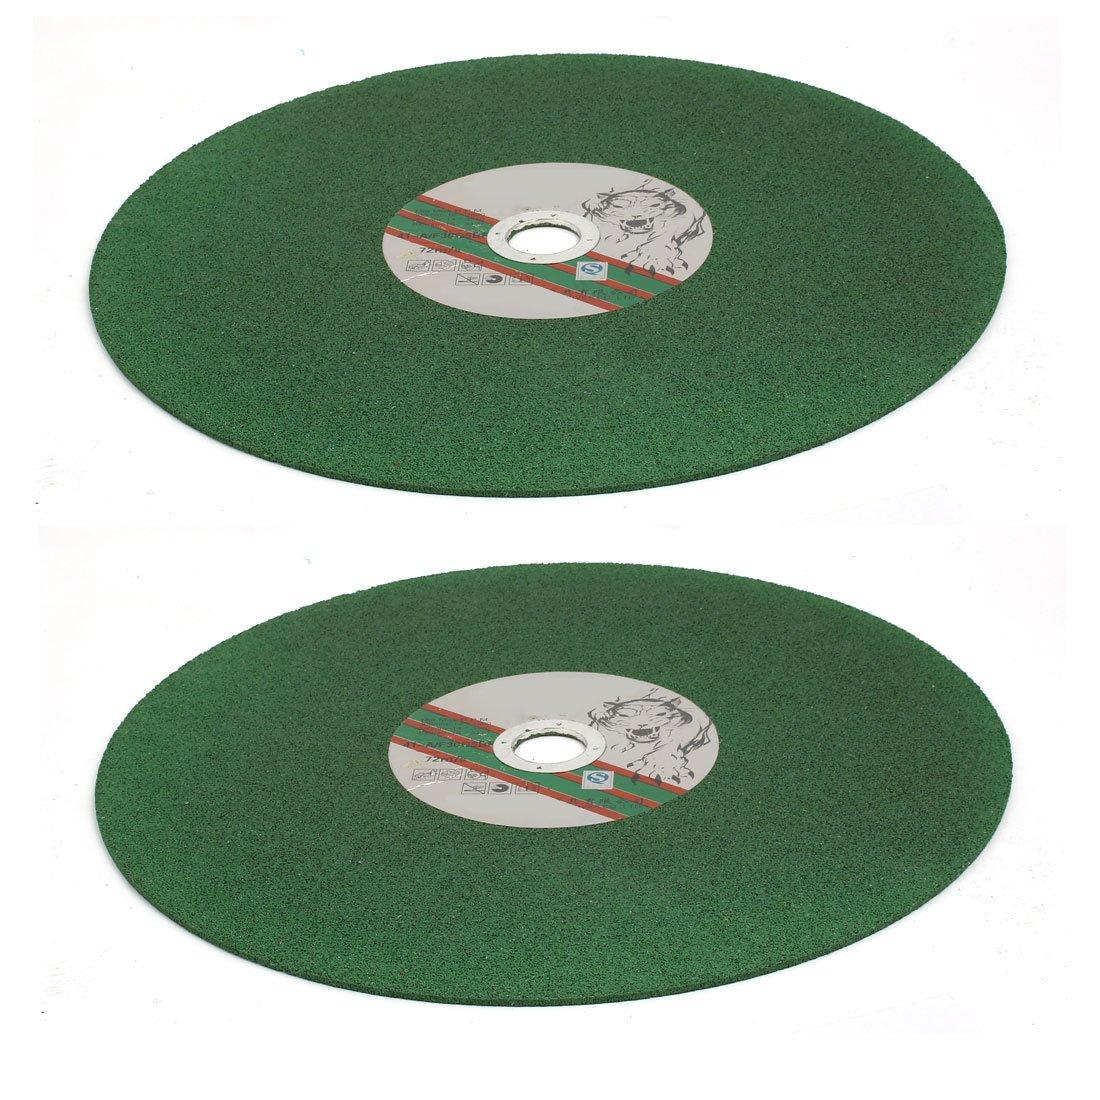 uxcell 400mmx32mm Cutting Wheel Grinding Cut Off Tool Green 3pcs